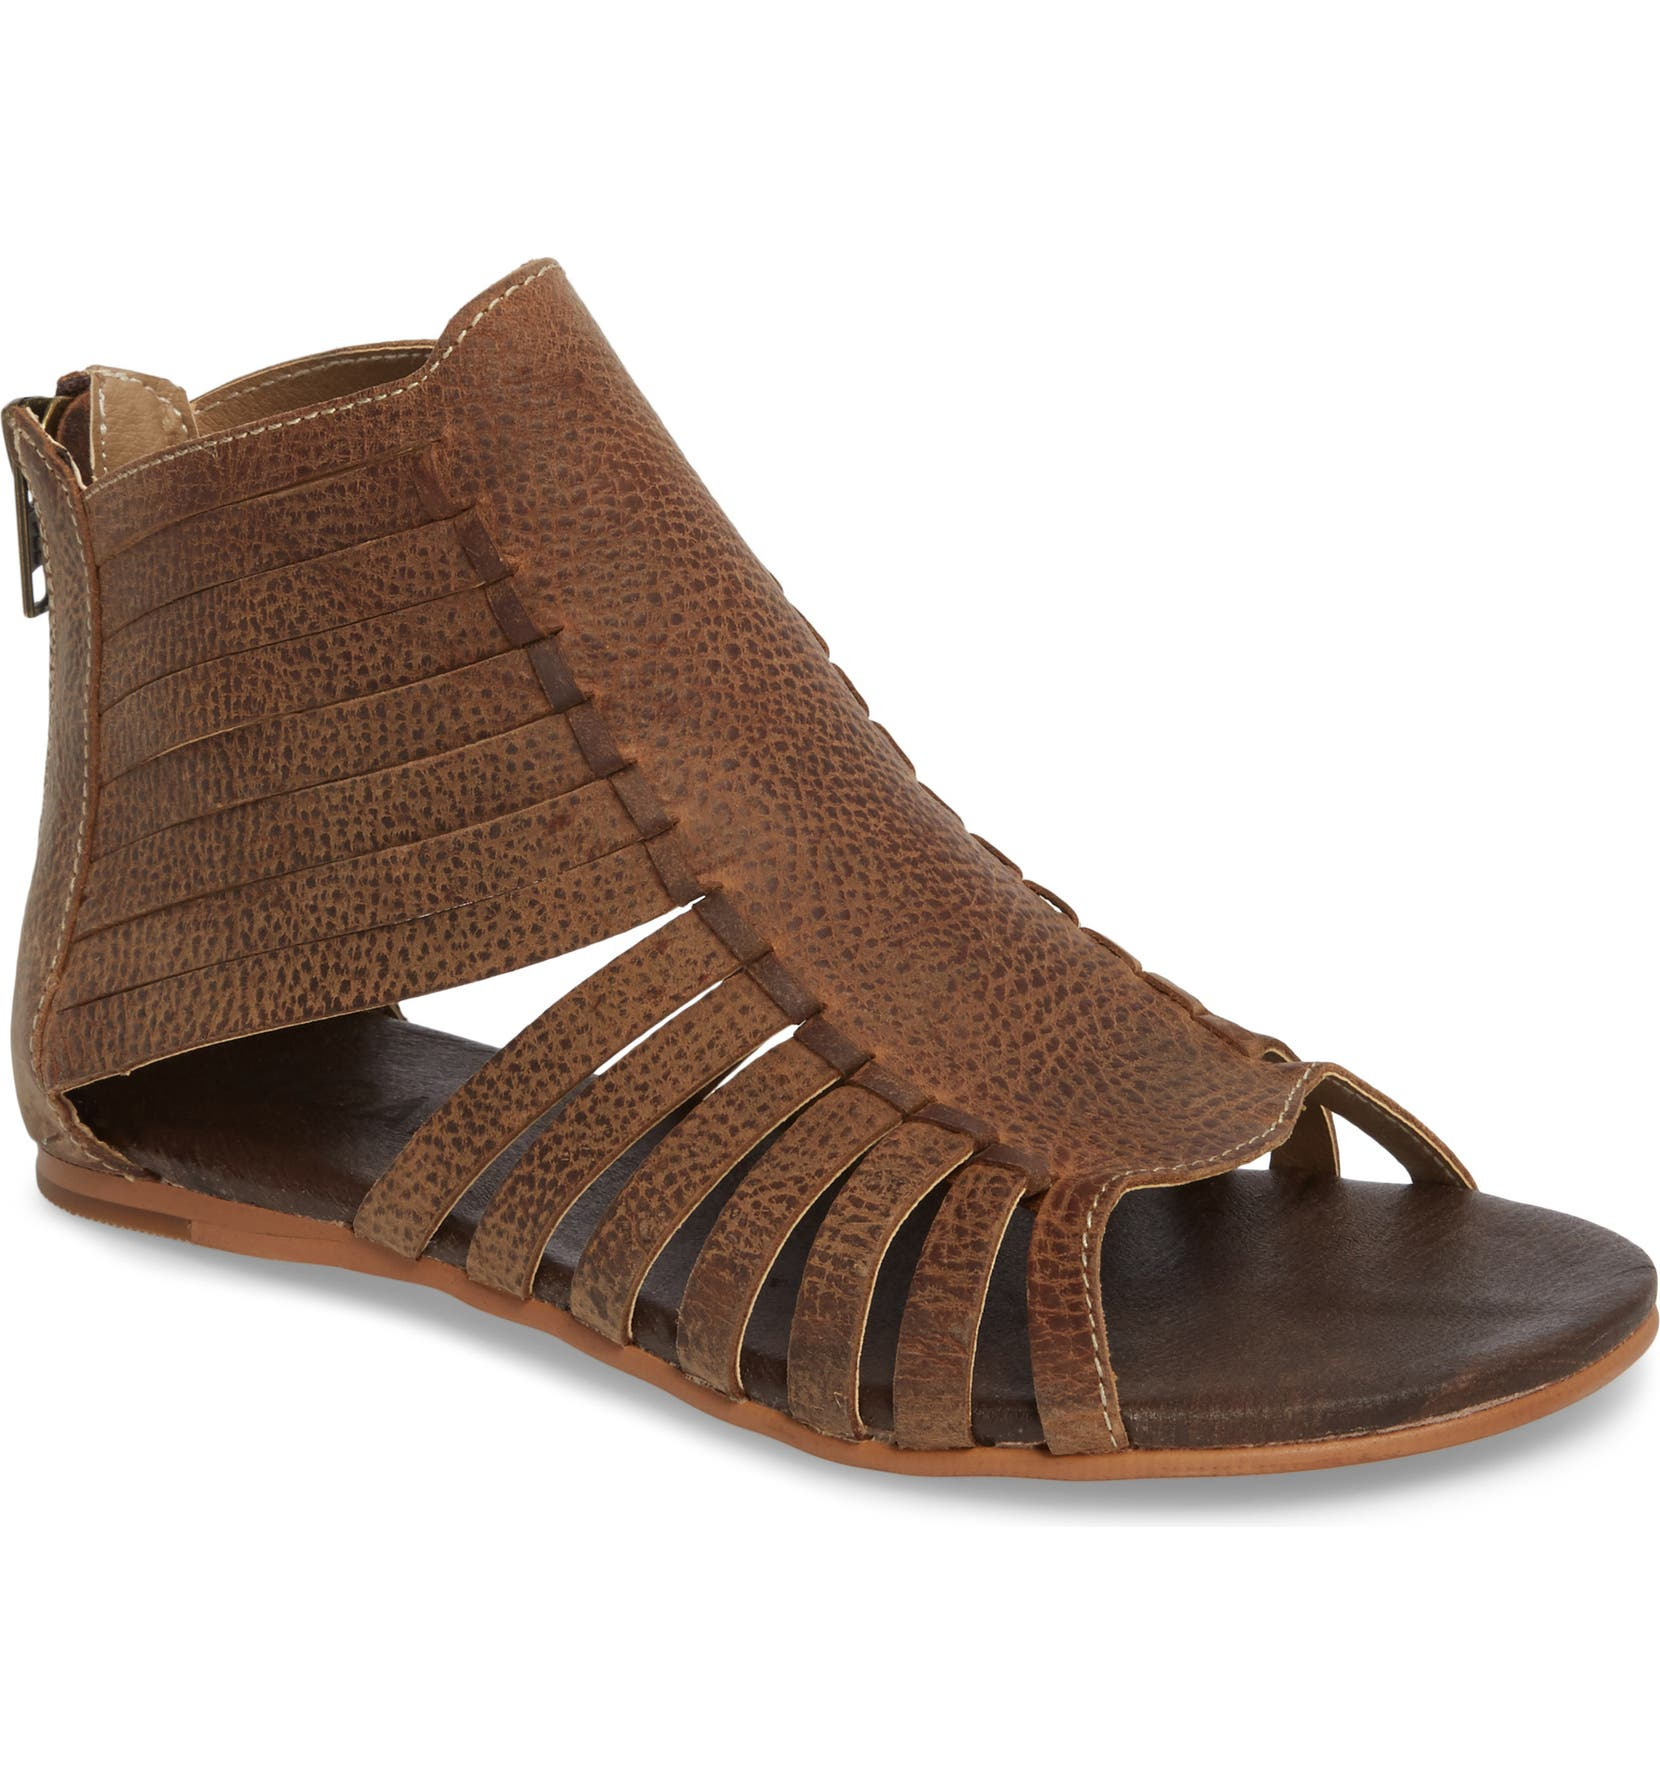 33e50c89b2c7 Roan Pearl Gladiator Sandal (Women)